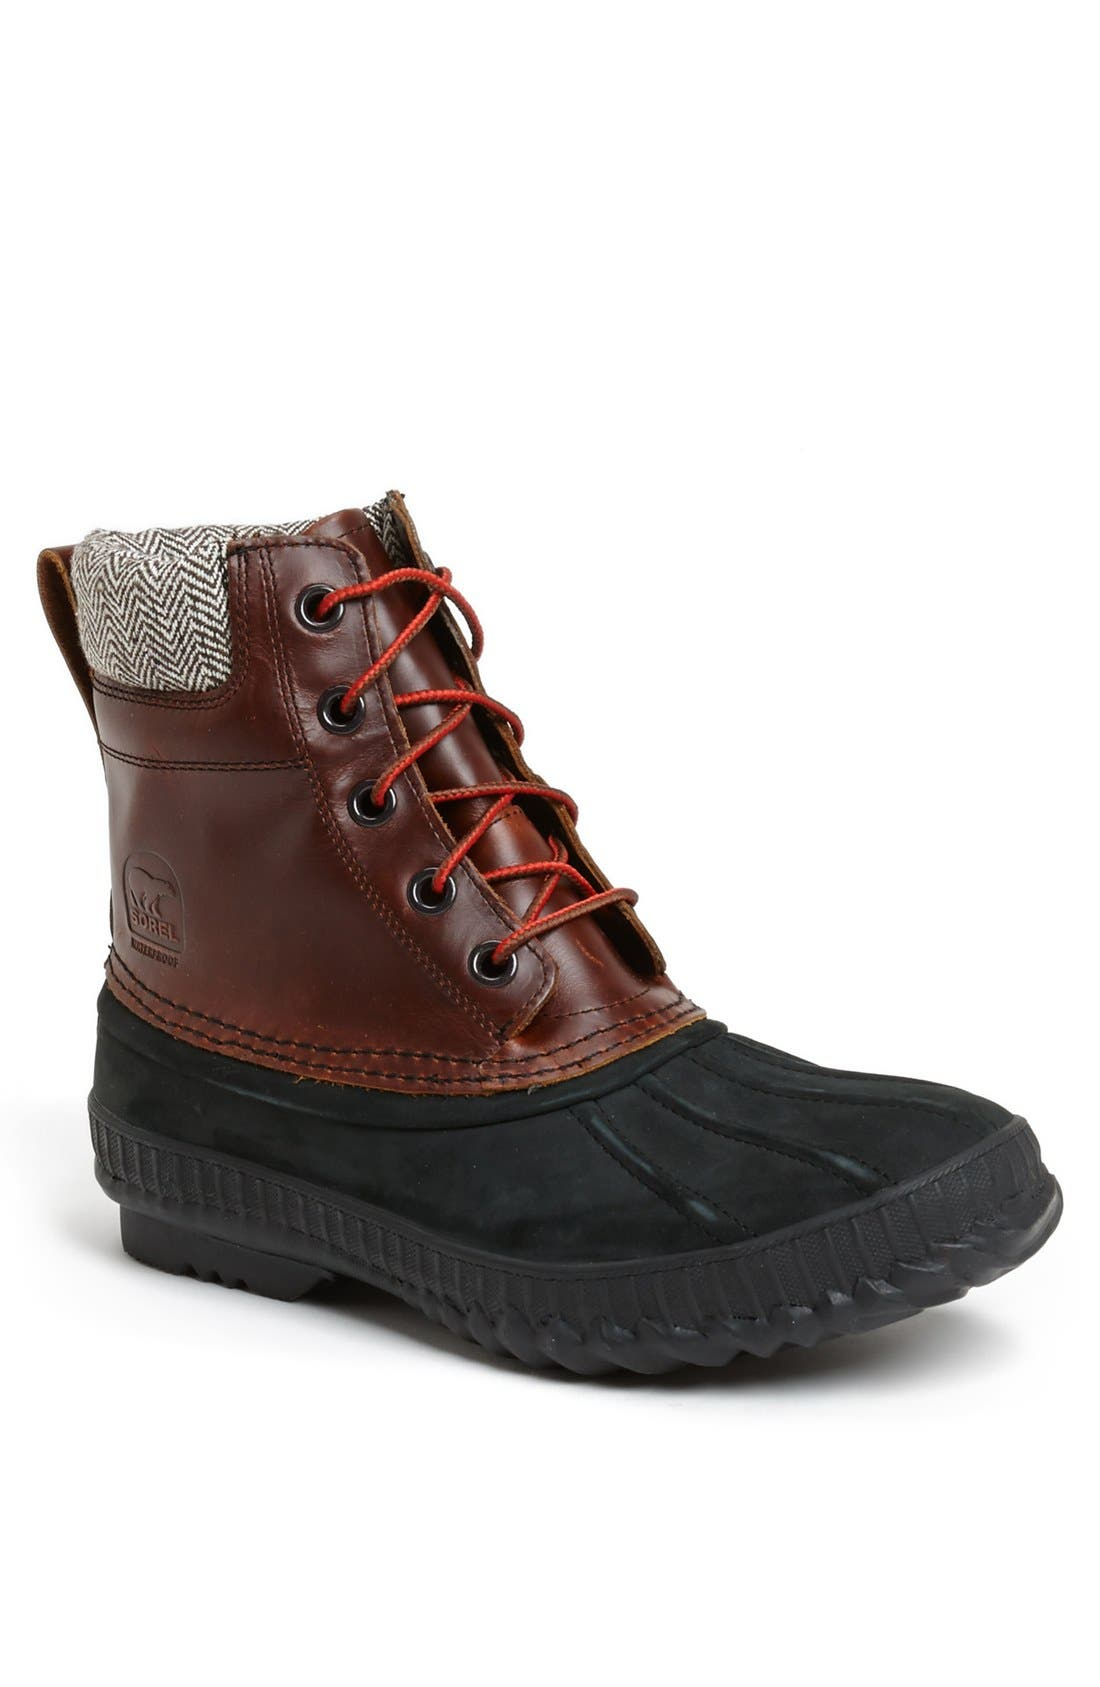 Main Image - SOREL 'Cheyanne Reserve' Waterproof Snow Boot